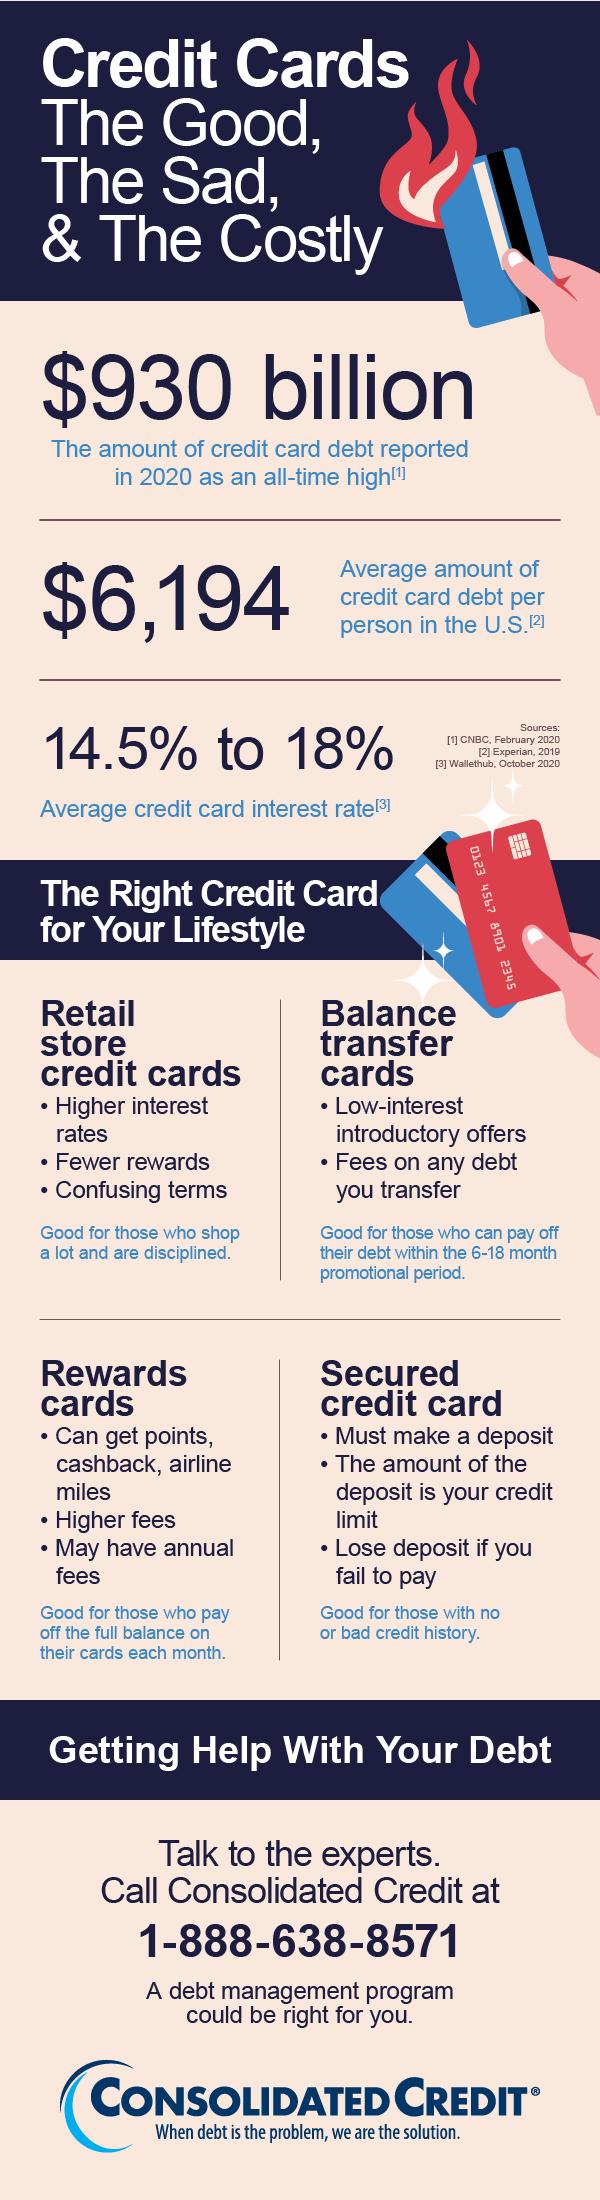 Credit Cards Webinar Infographic